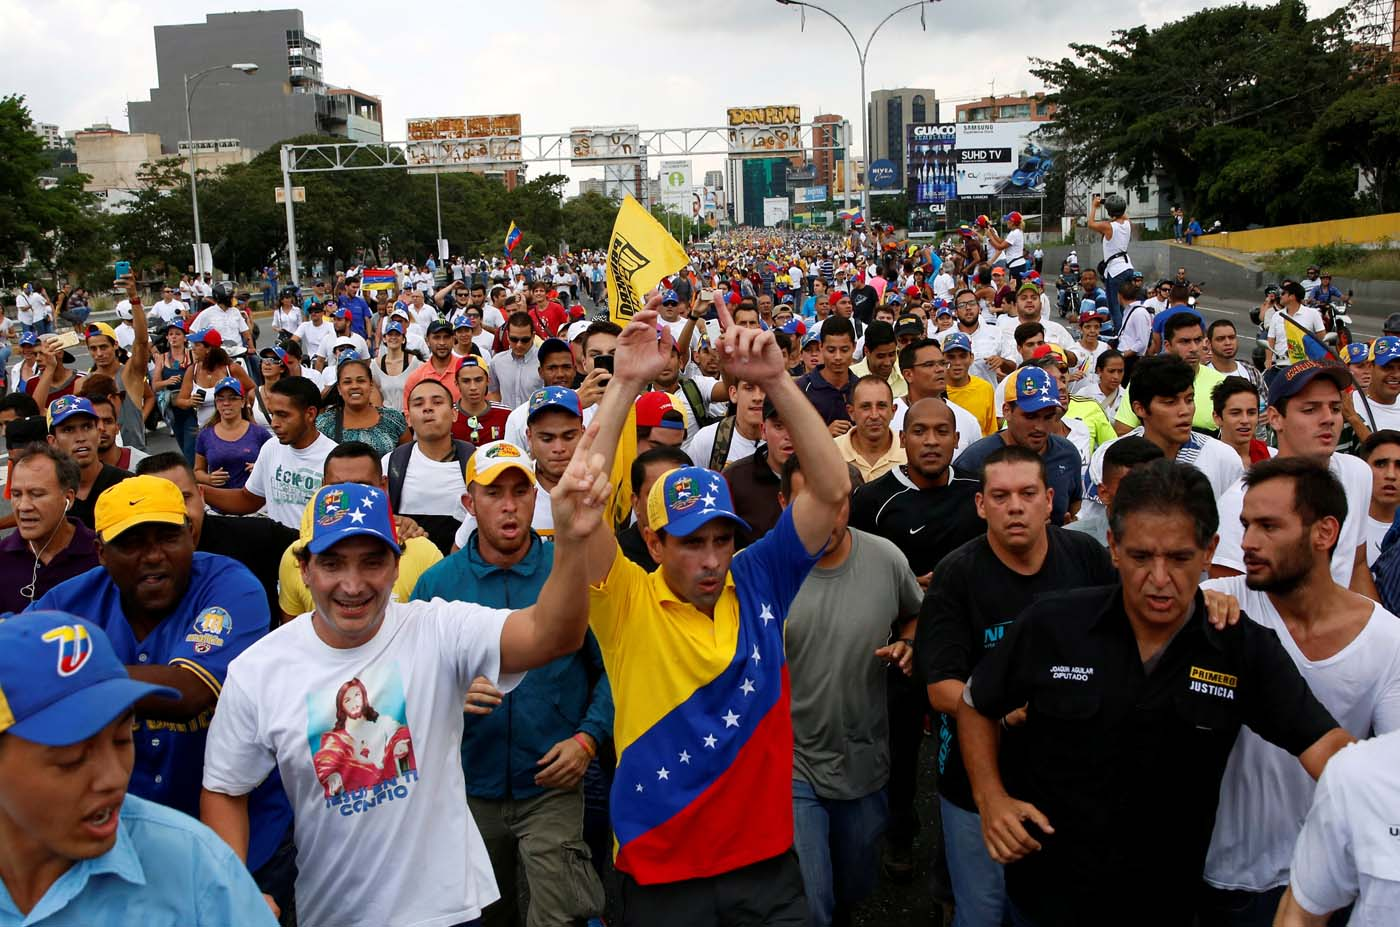 2016-10-26T172855Z_893966361_S1AEUJFRFZAA_RTRMADP_3_VENEZUELA-POLITICS